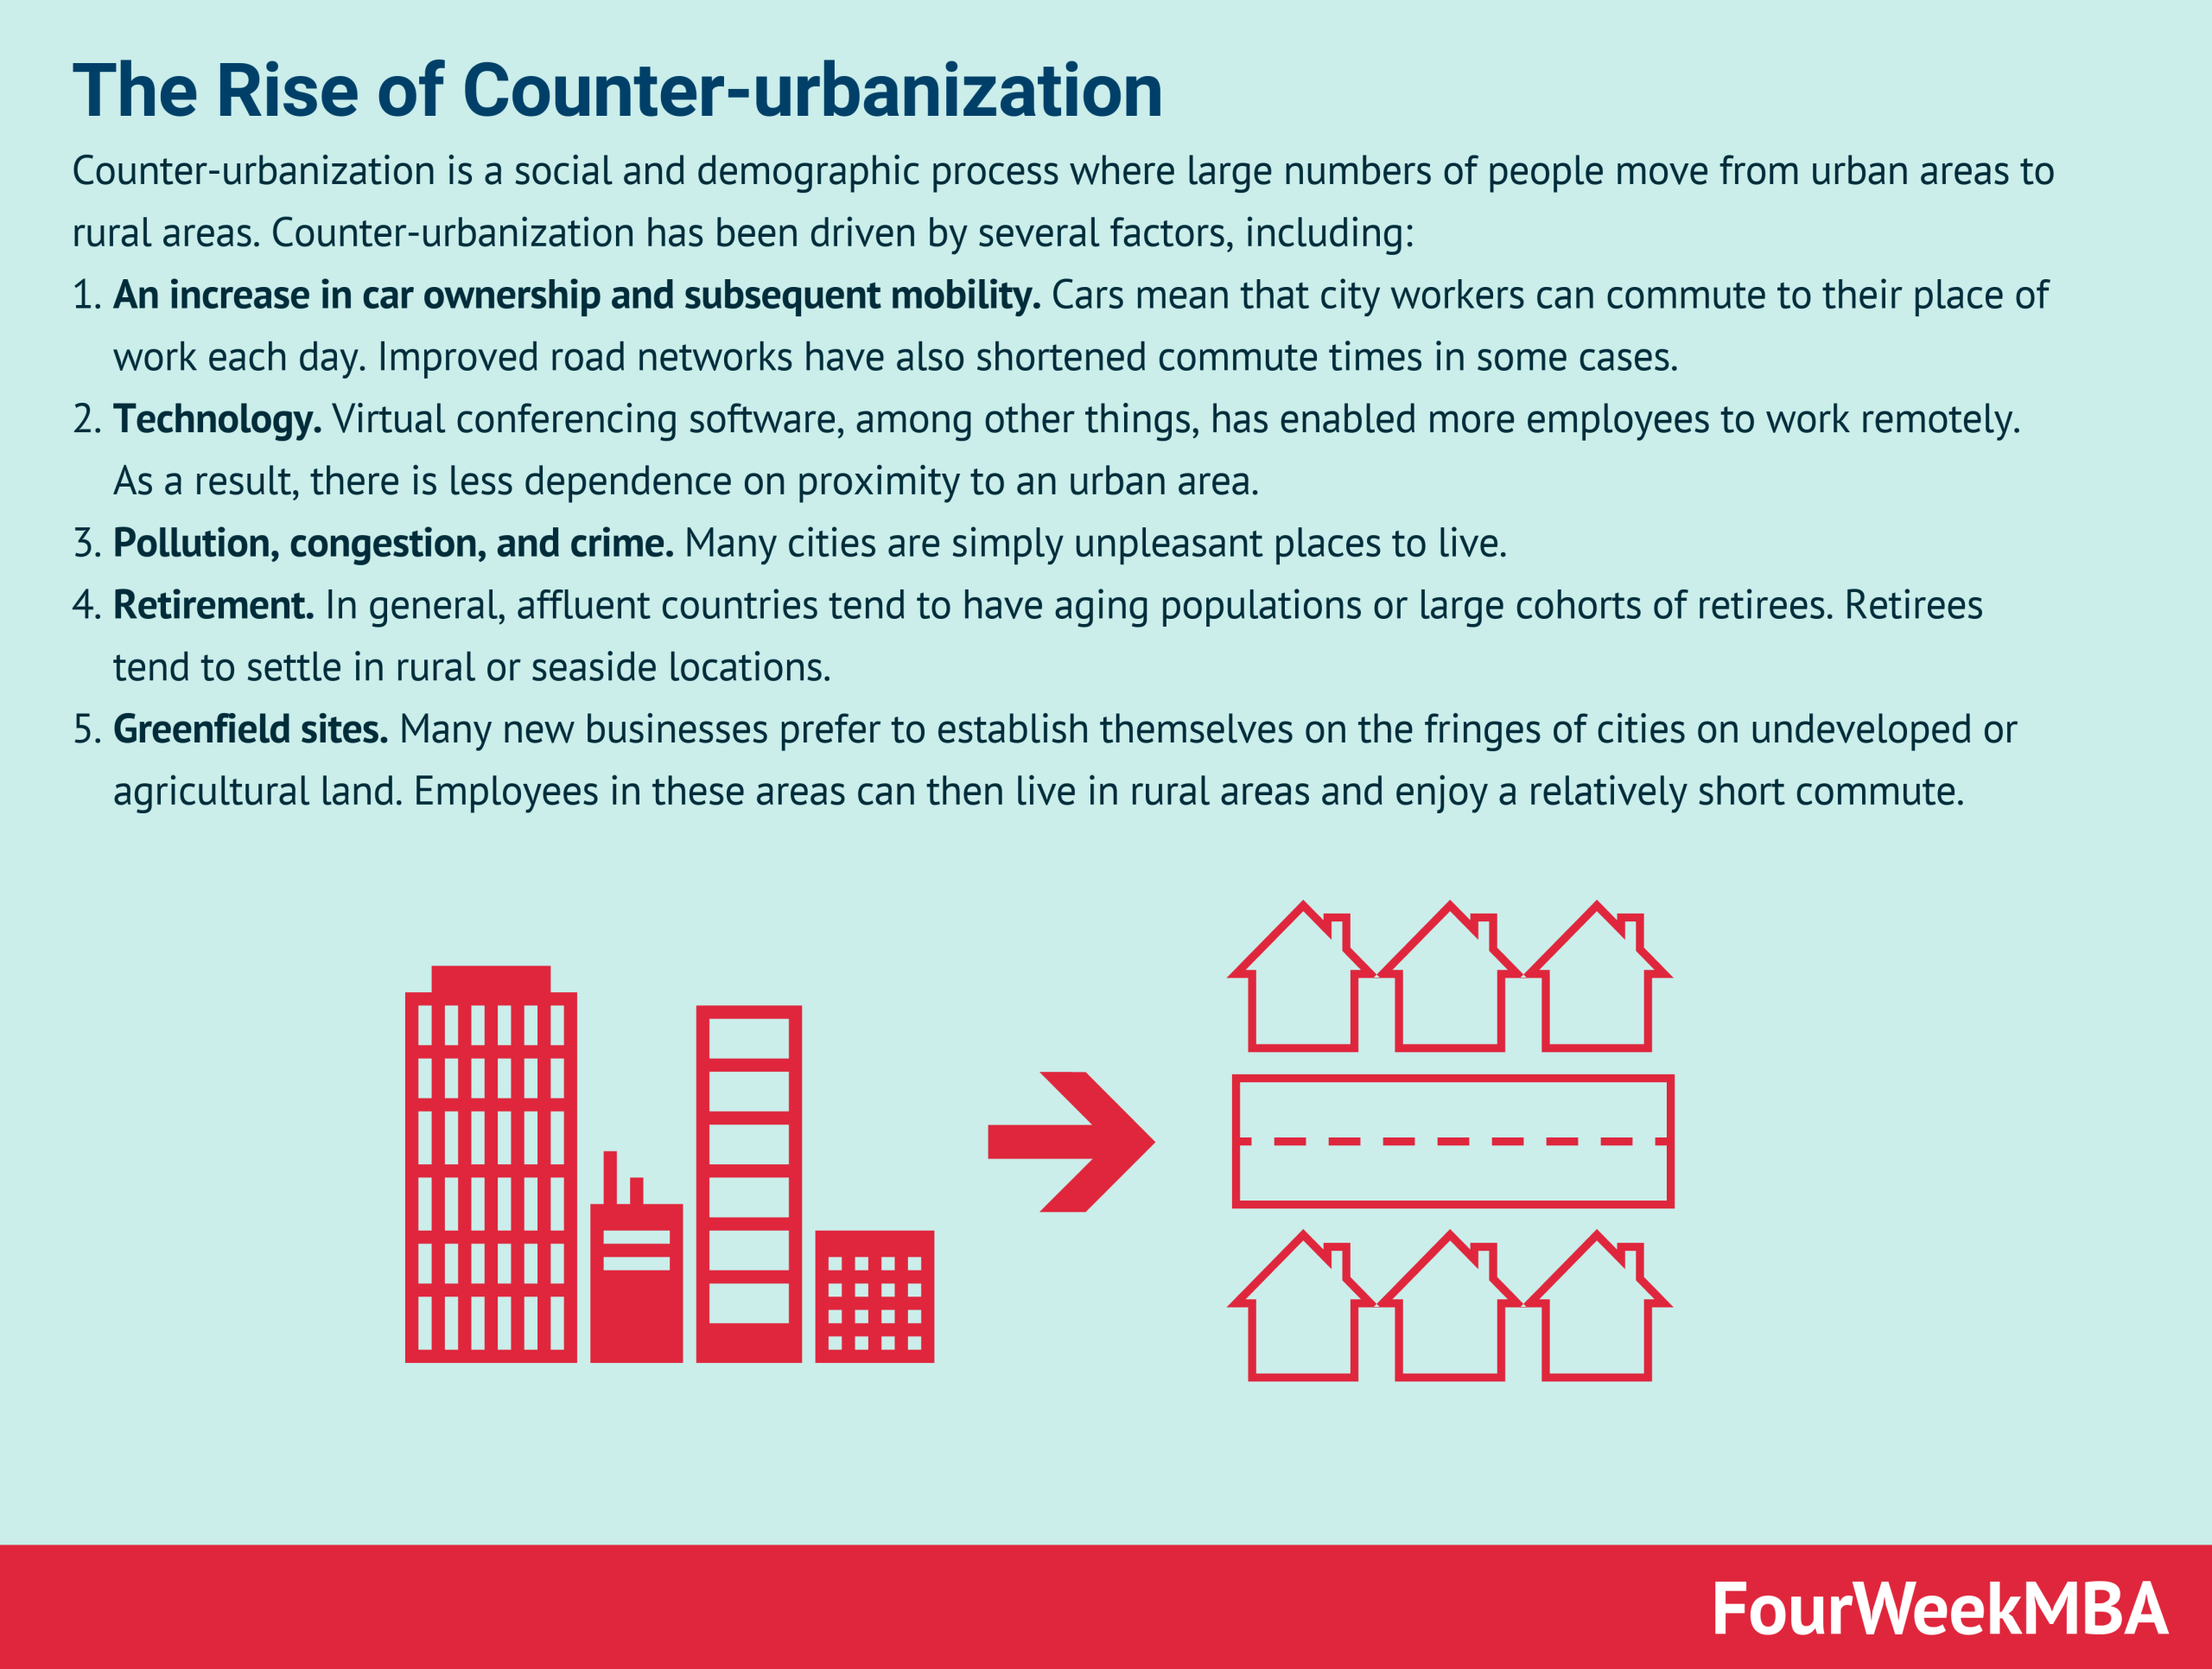 counter-urbanization